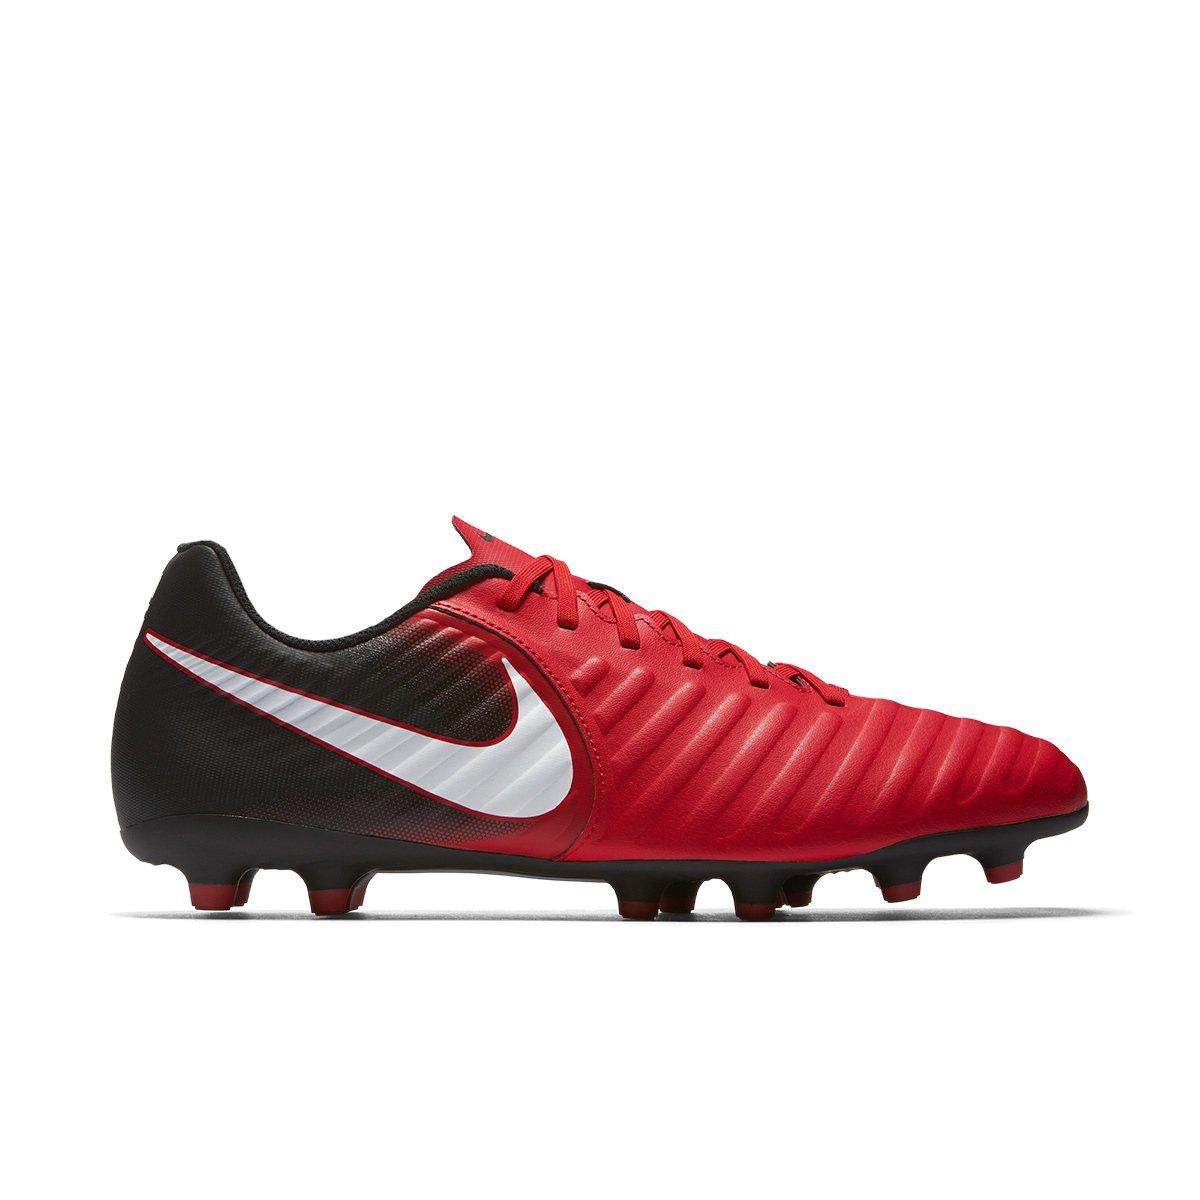 279eab5e8 Nike Chuteira Para Pintar Related Keywords   Suggestions - Nike ...